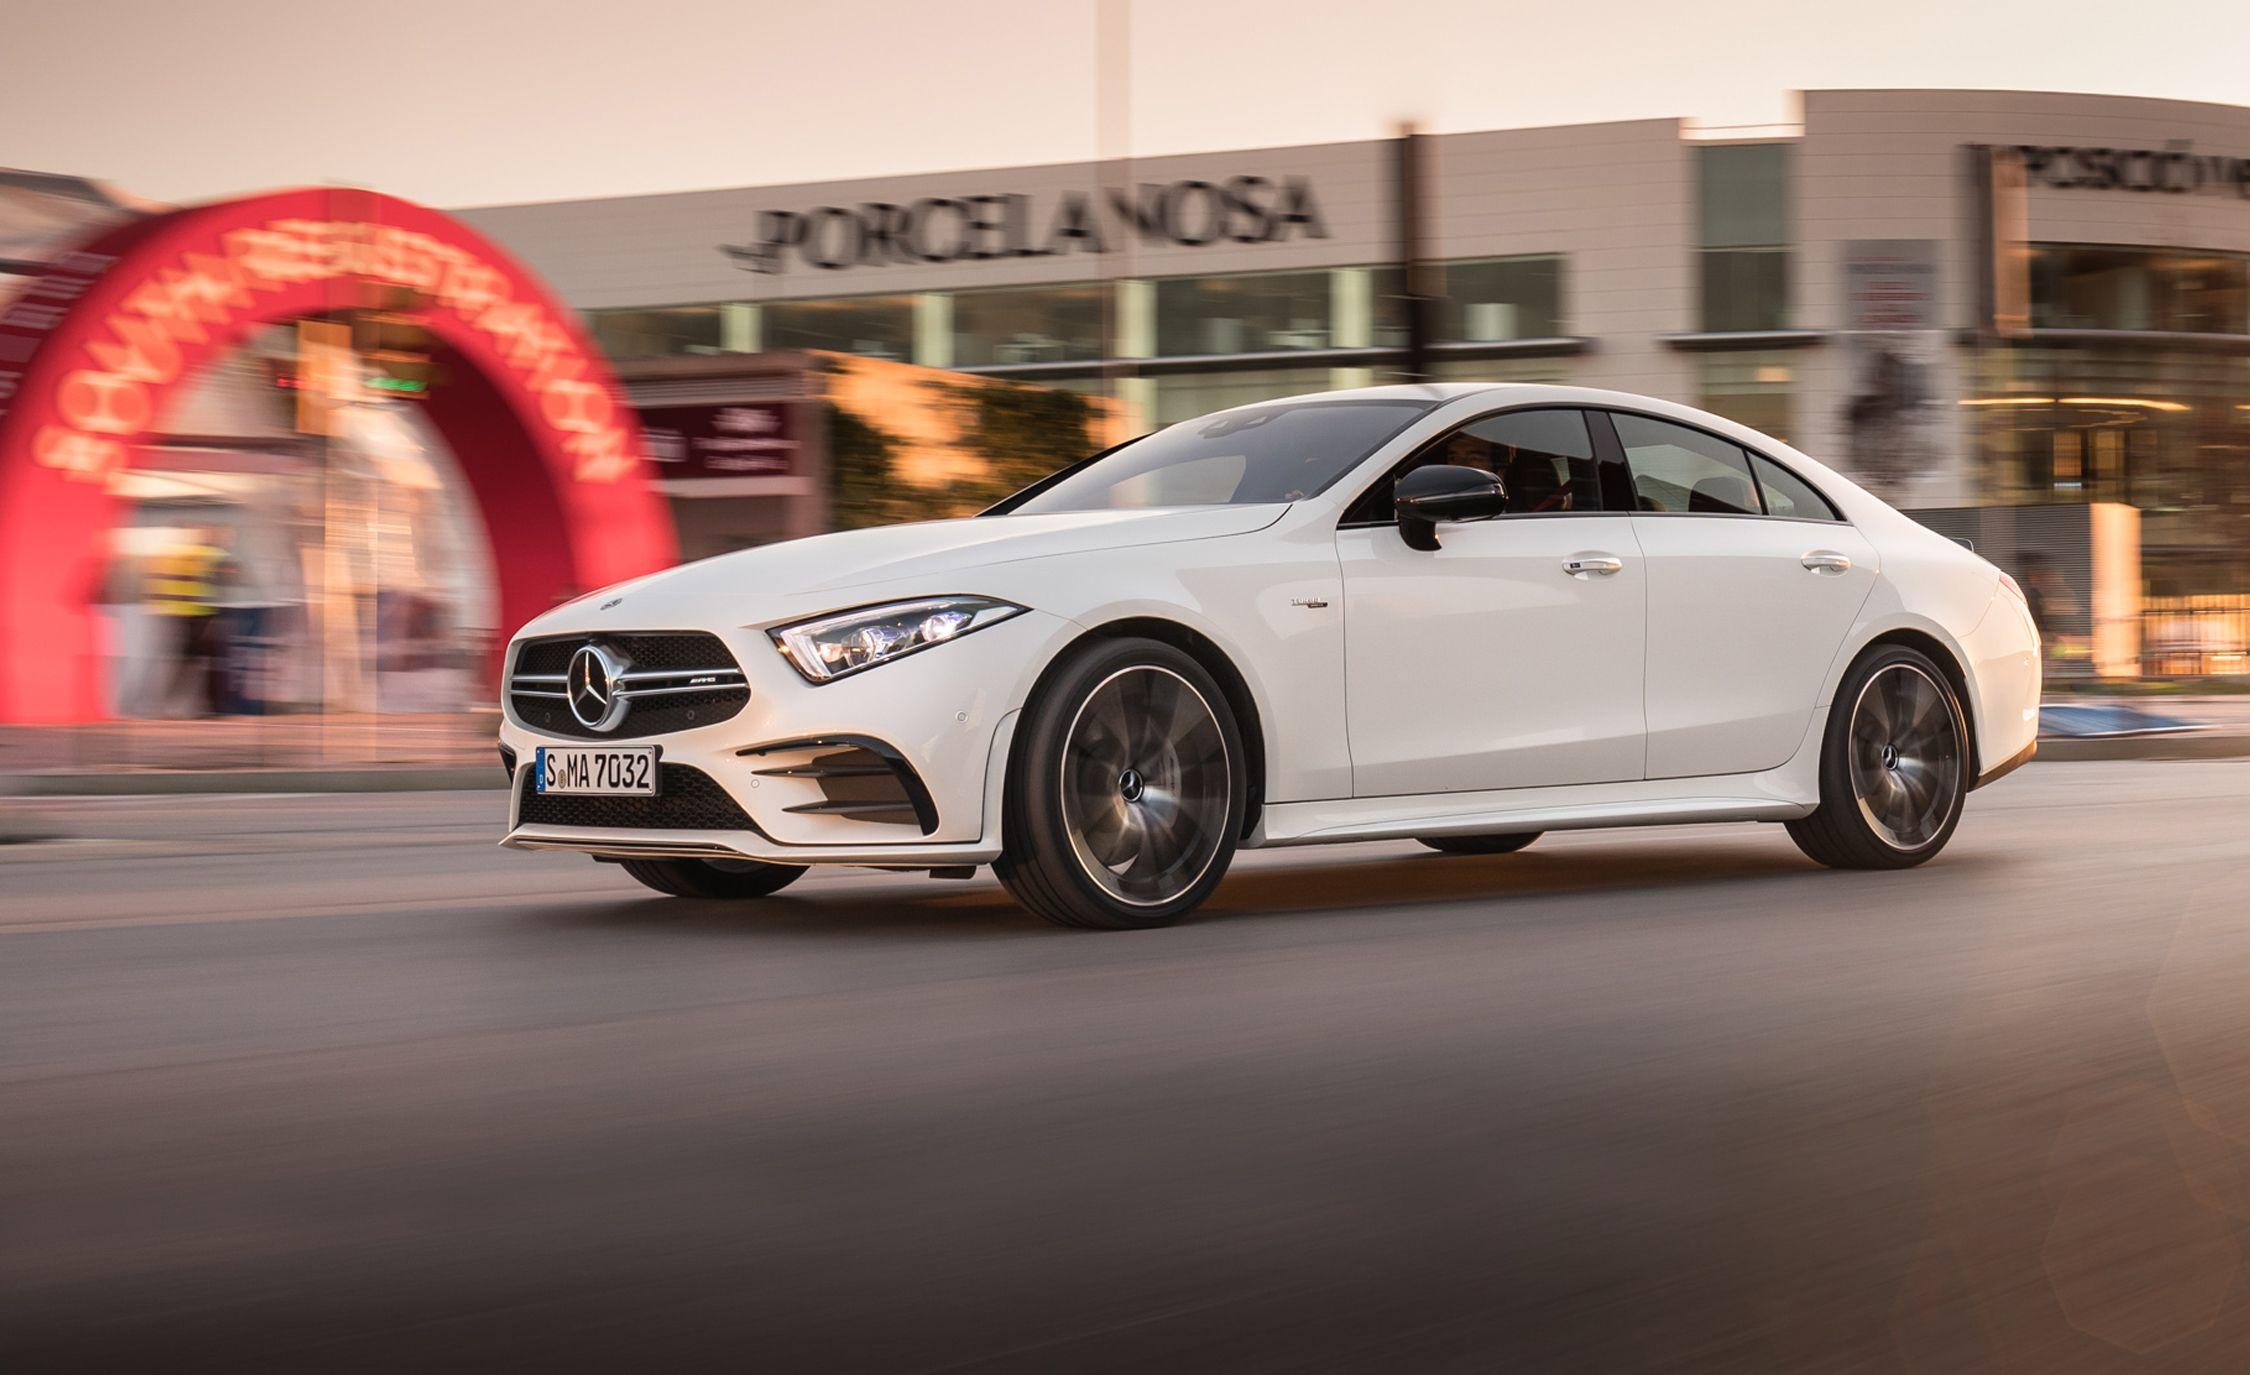 2019 Mercedes Benz CLS Class / CLS53 AMG